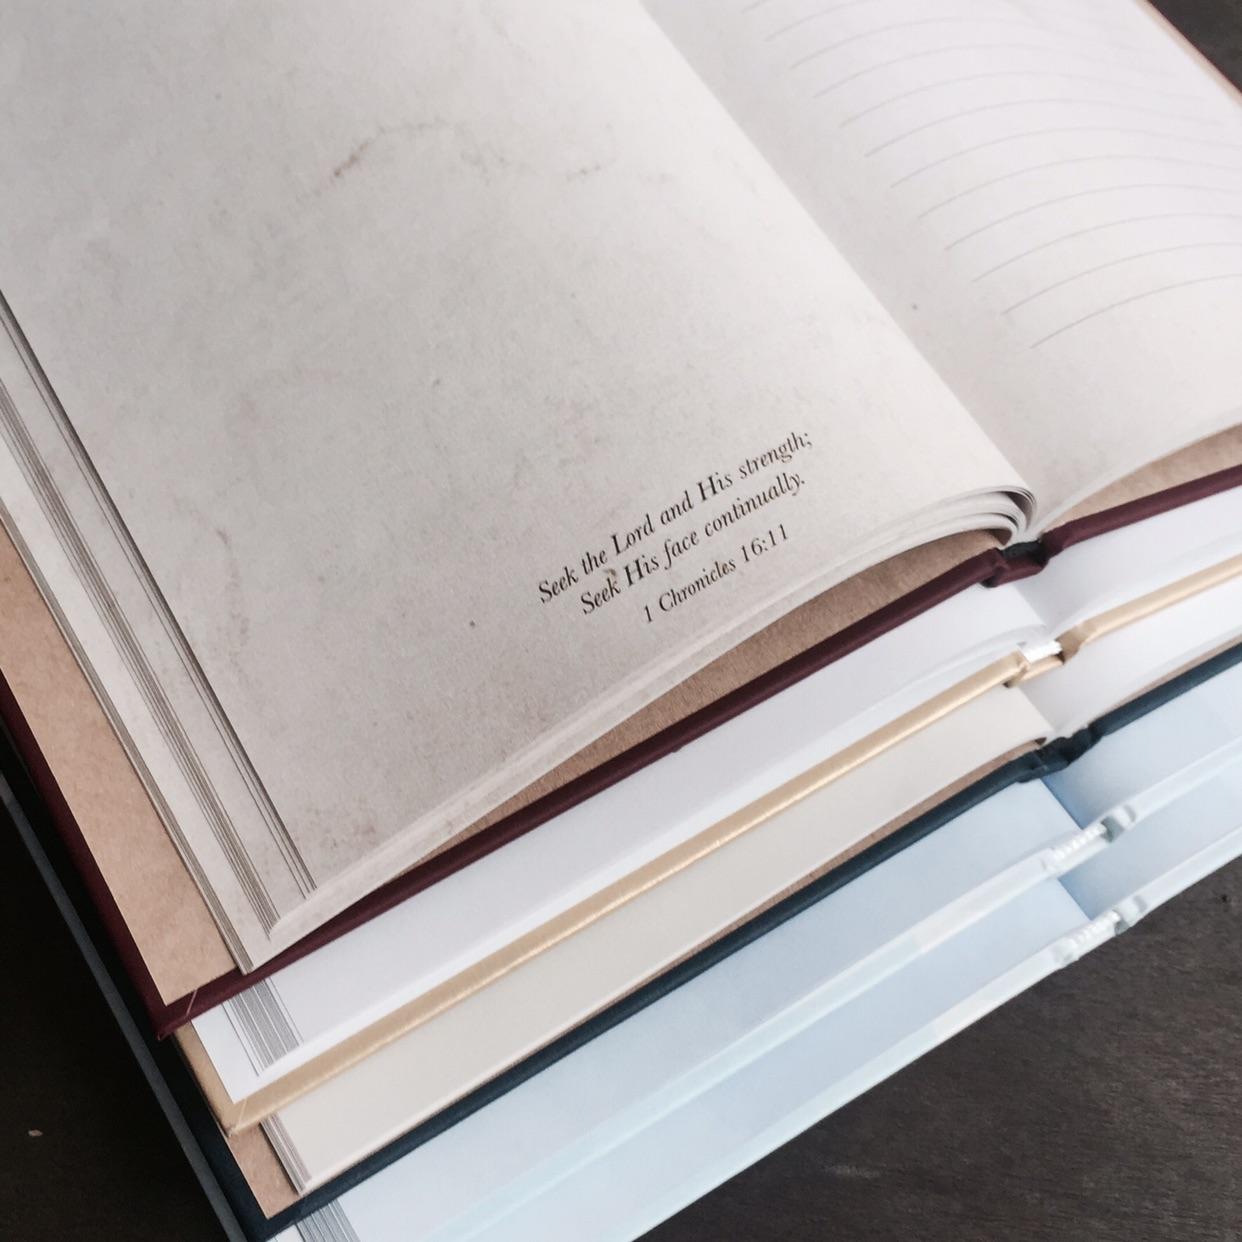 christian journals inspiring faith bible habits